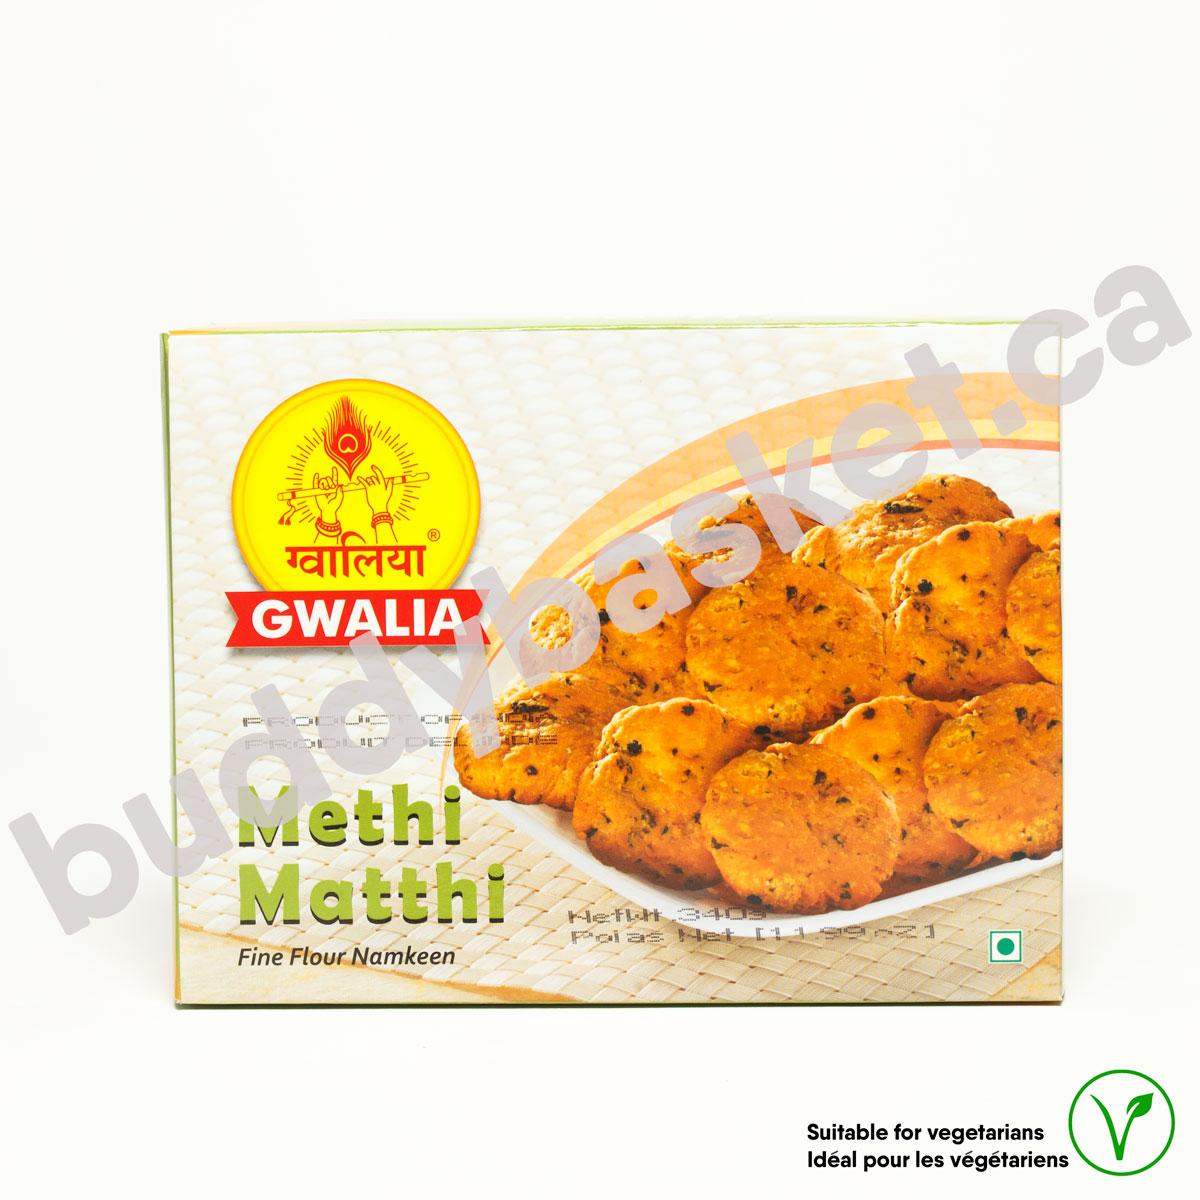 Gwalia Methi Matthi 340g